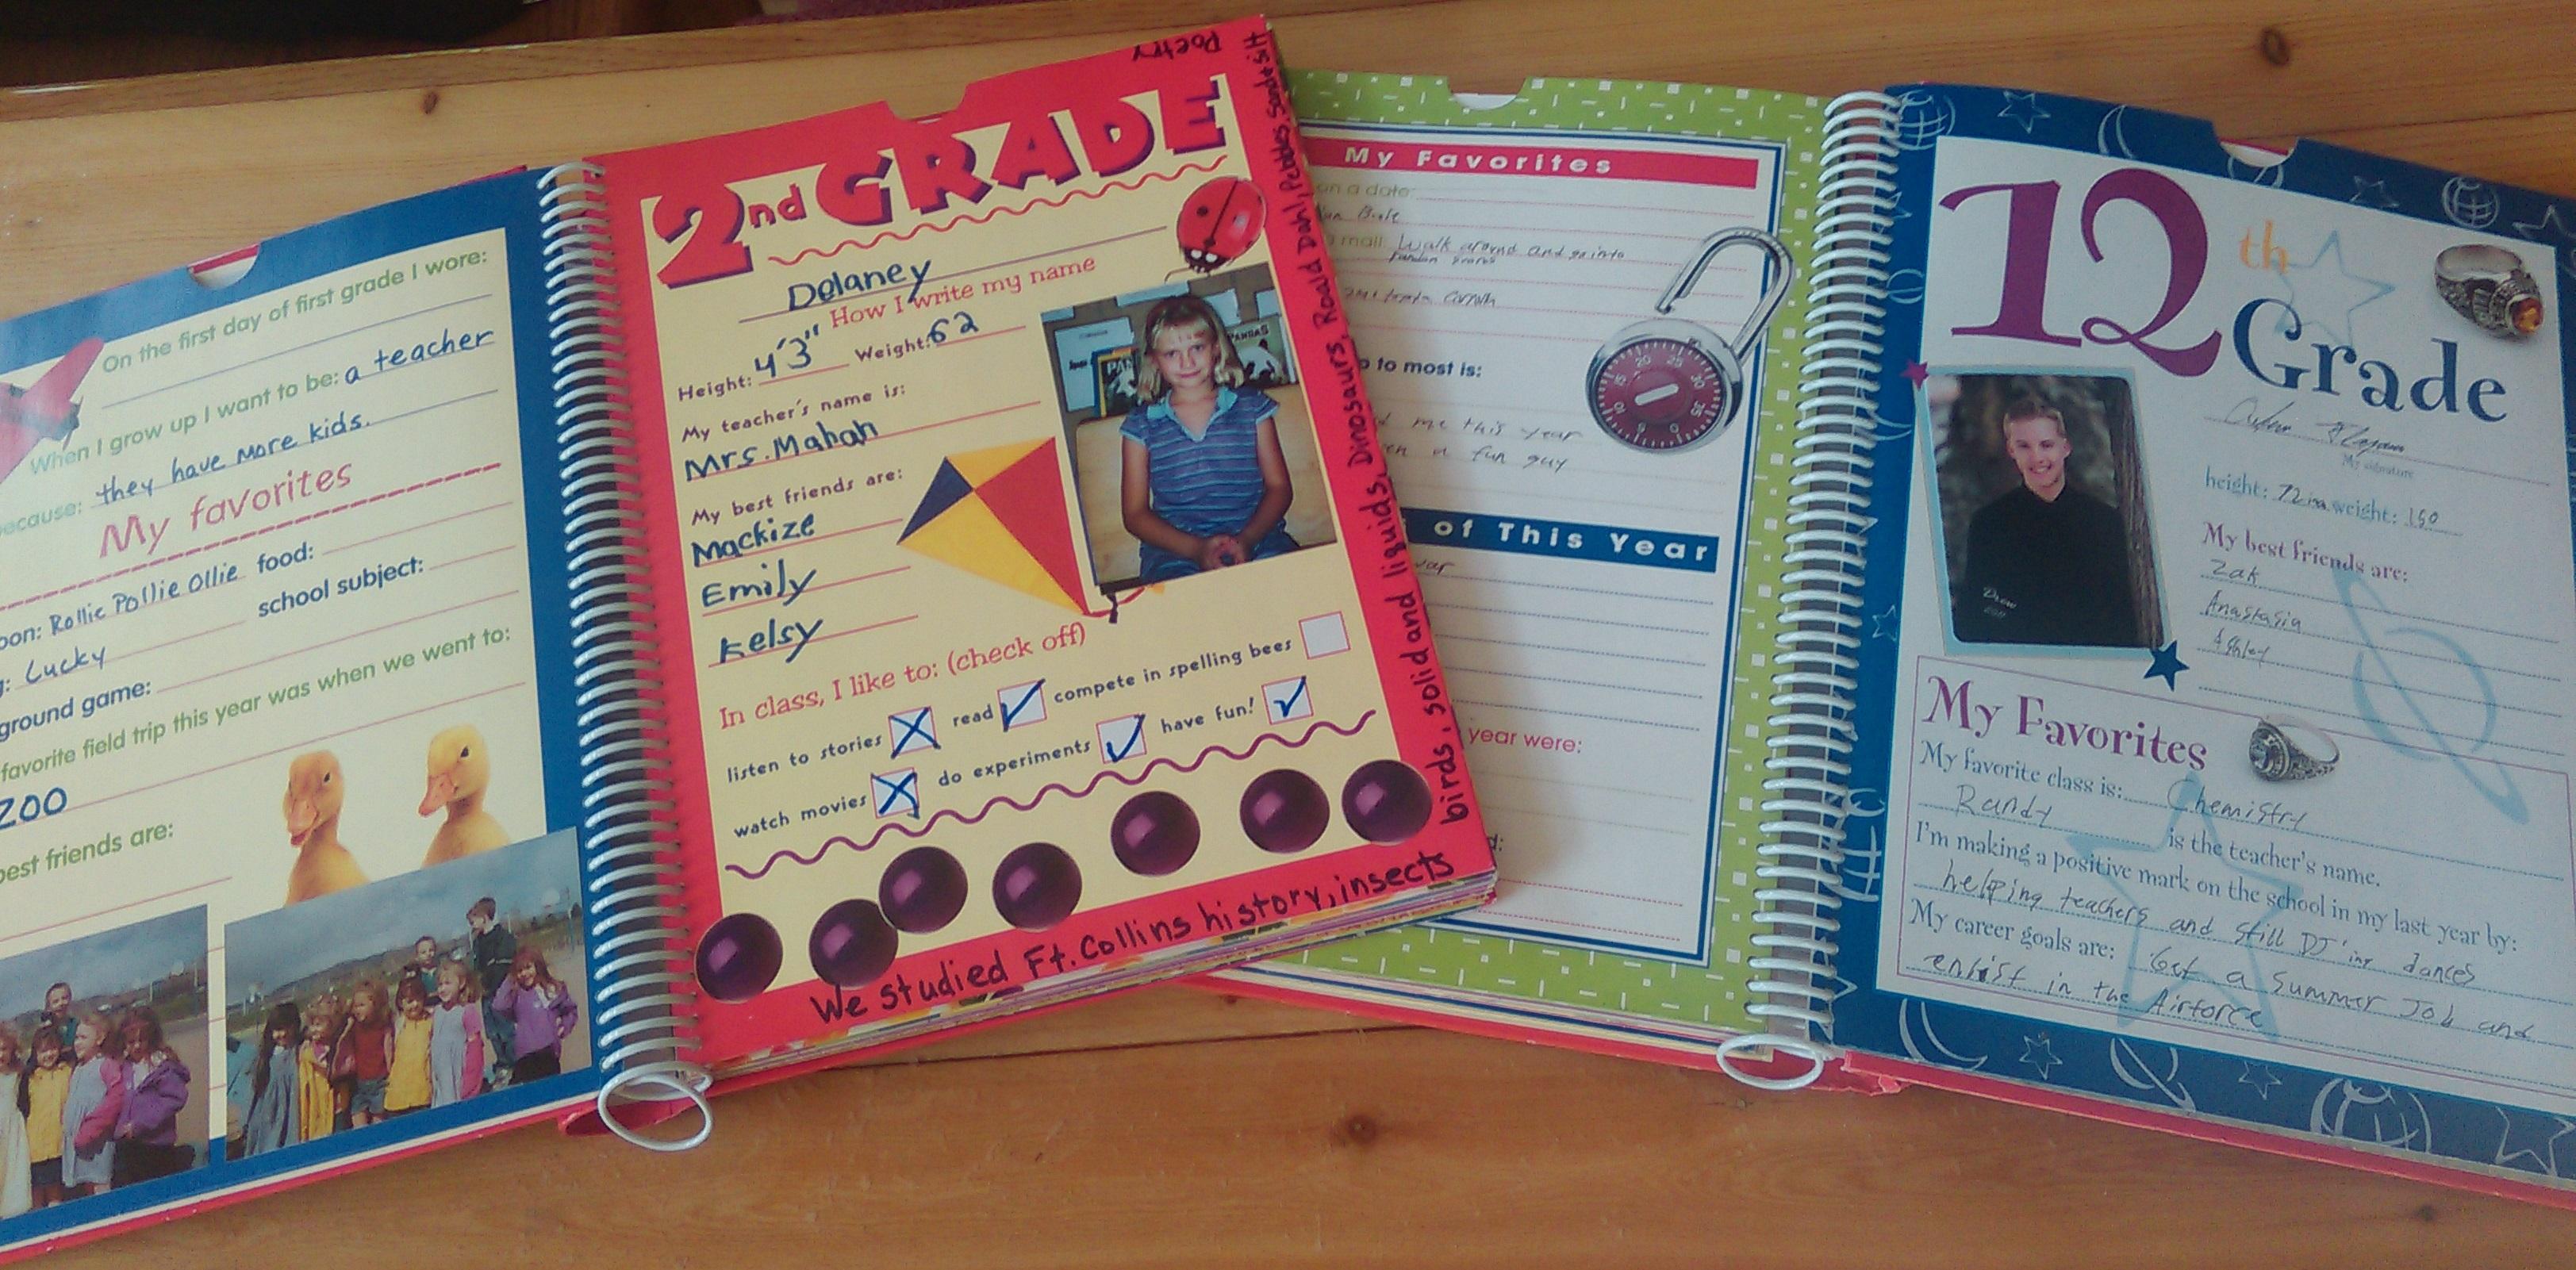 Memory Book Cover Ideas : Capture school year memories — birthday keepsakes